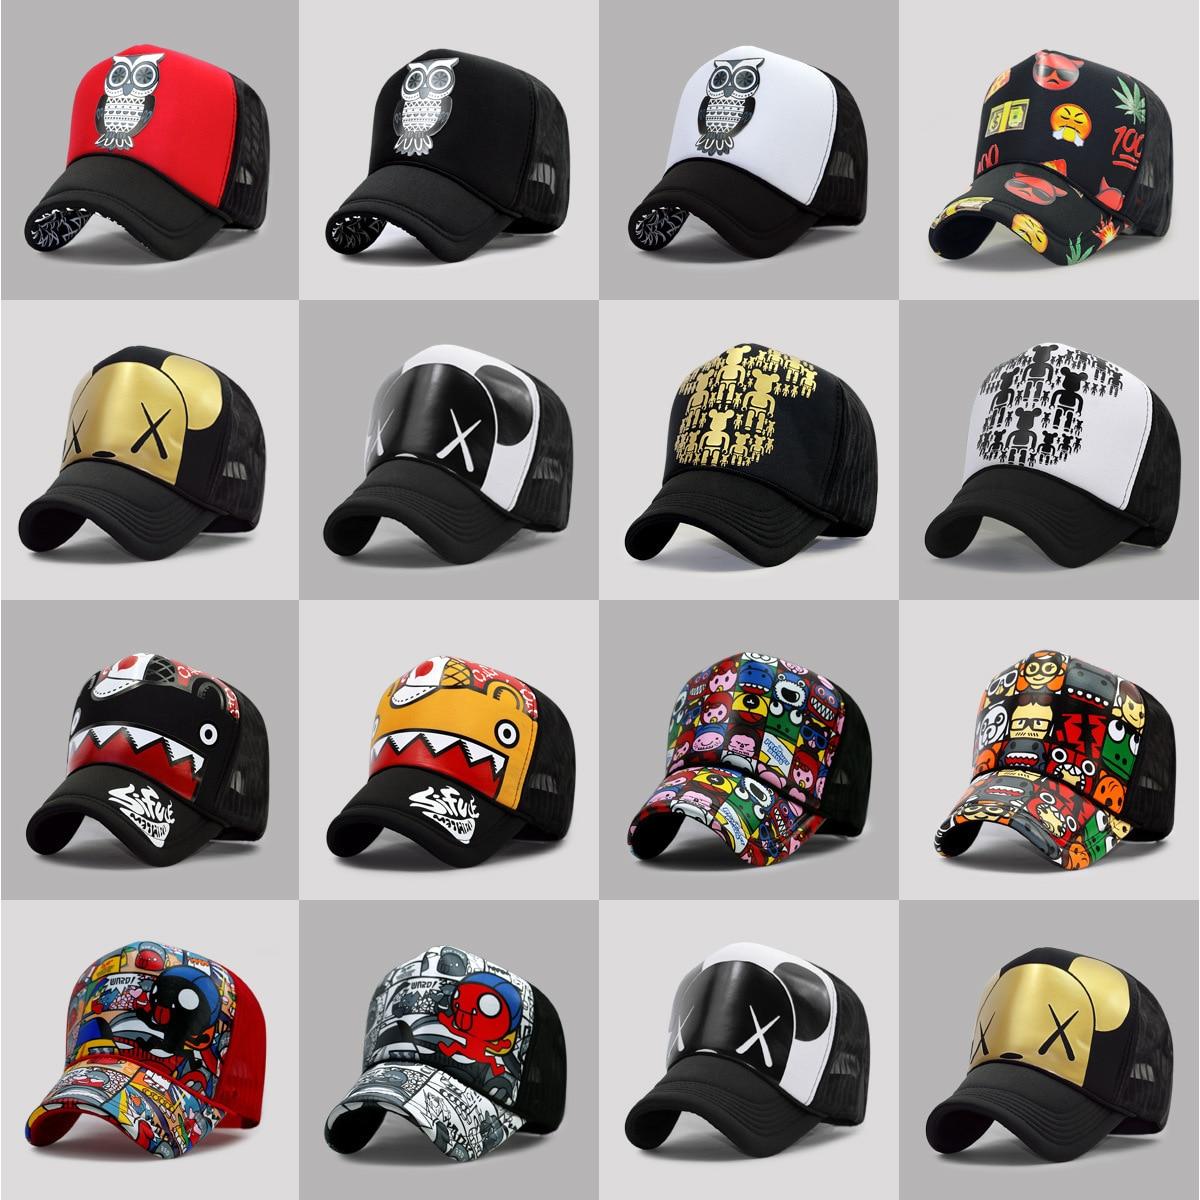 Wholesale Adult Summer Sun Hats Men Cool Hiphop Punk Rock Truck Cap Women Fashion Mesh Baseball Caps